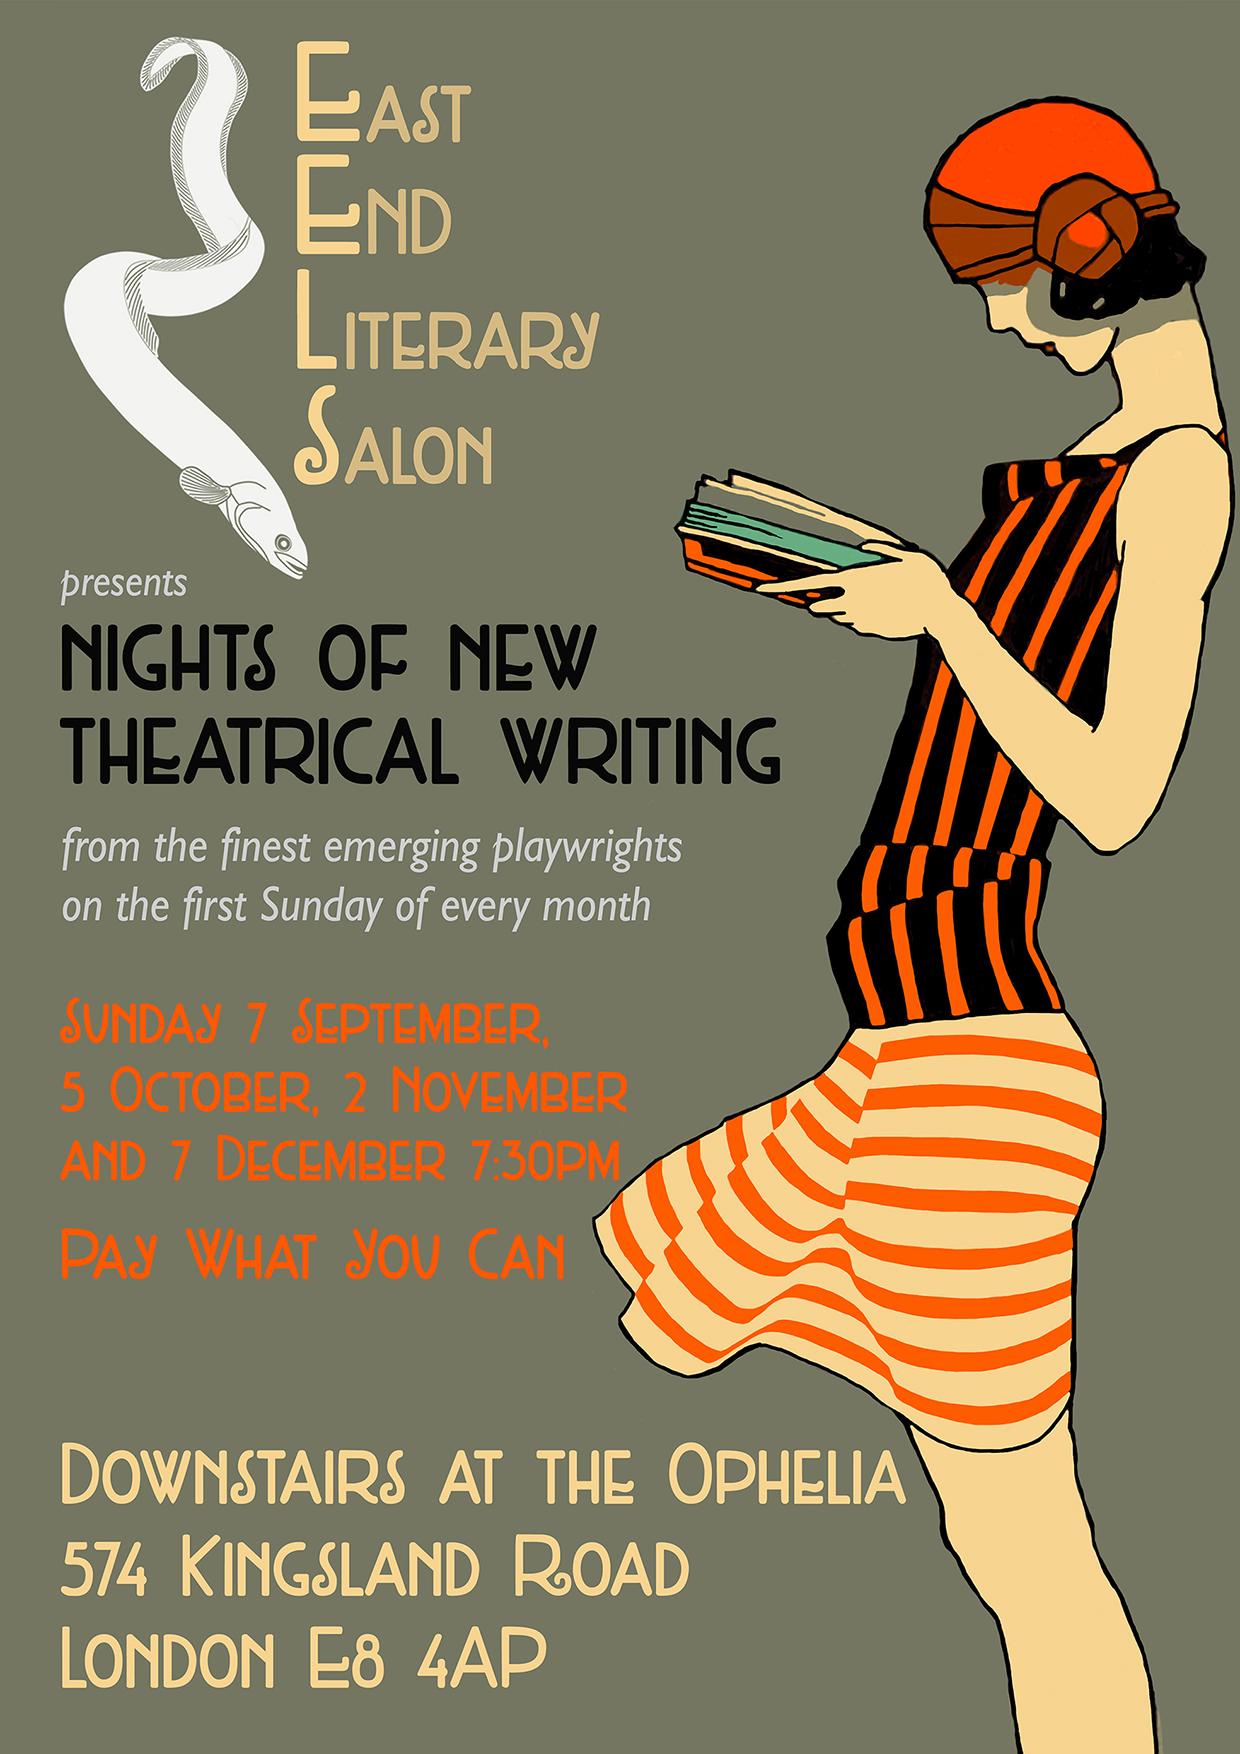 East End Literary Salon